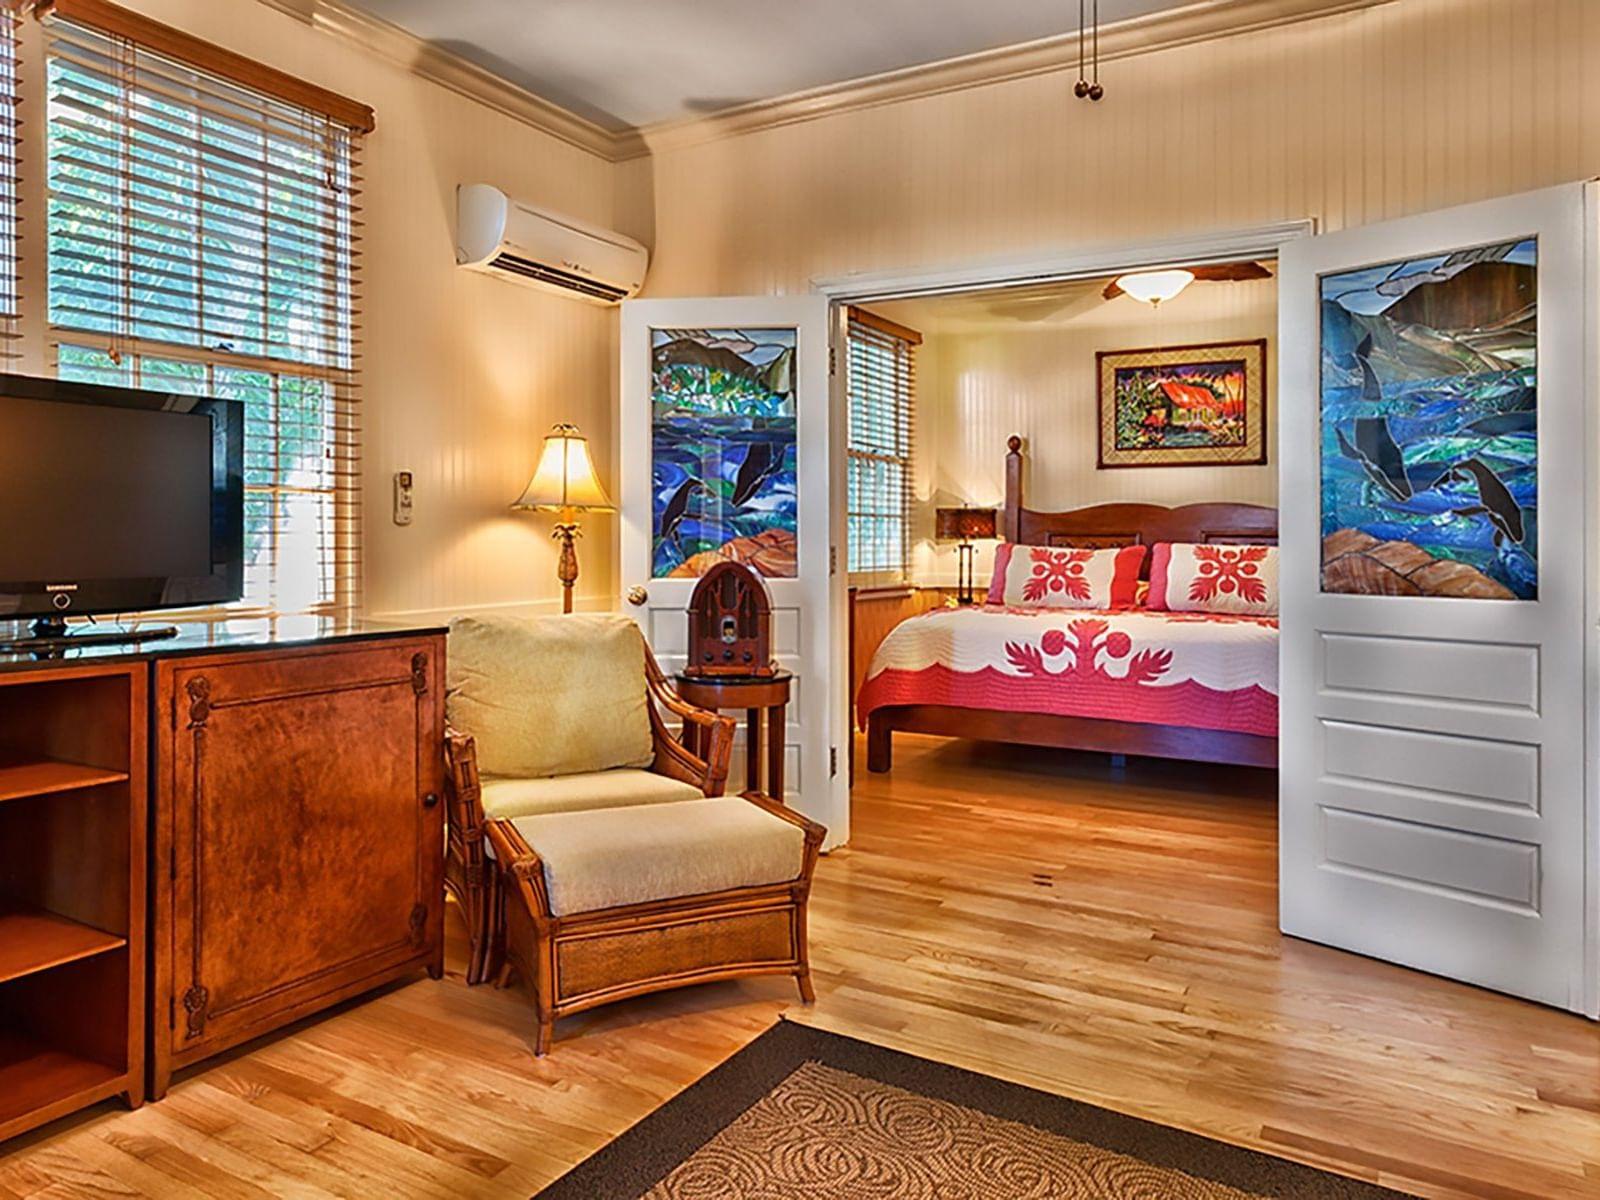 living room with wooden decor and door to bedroom